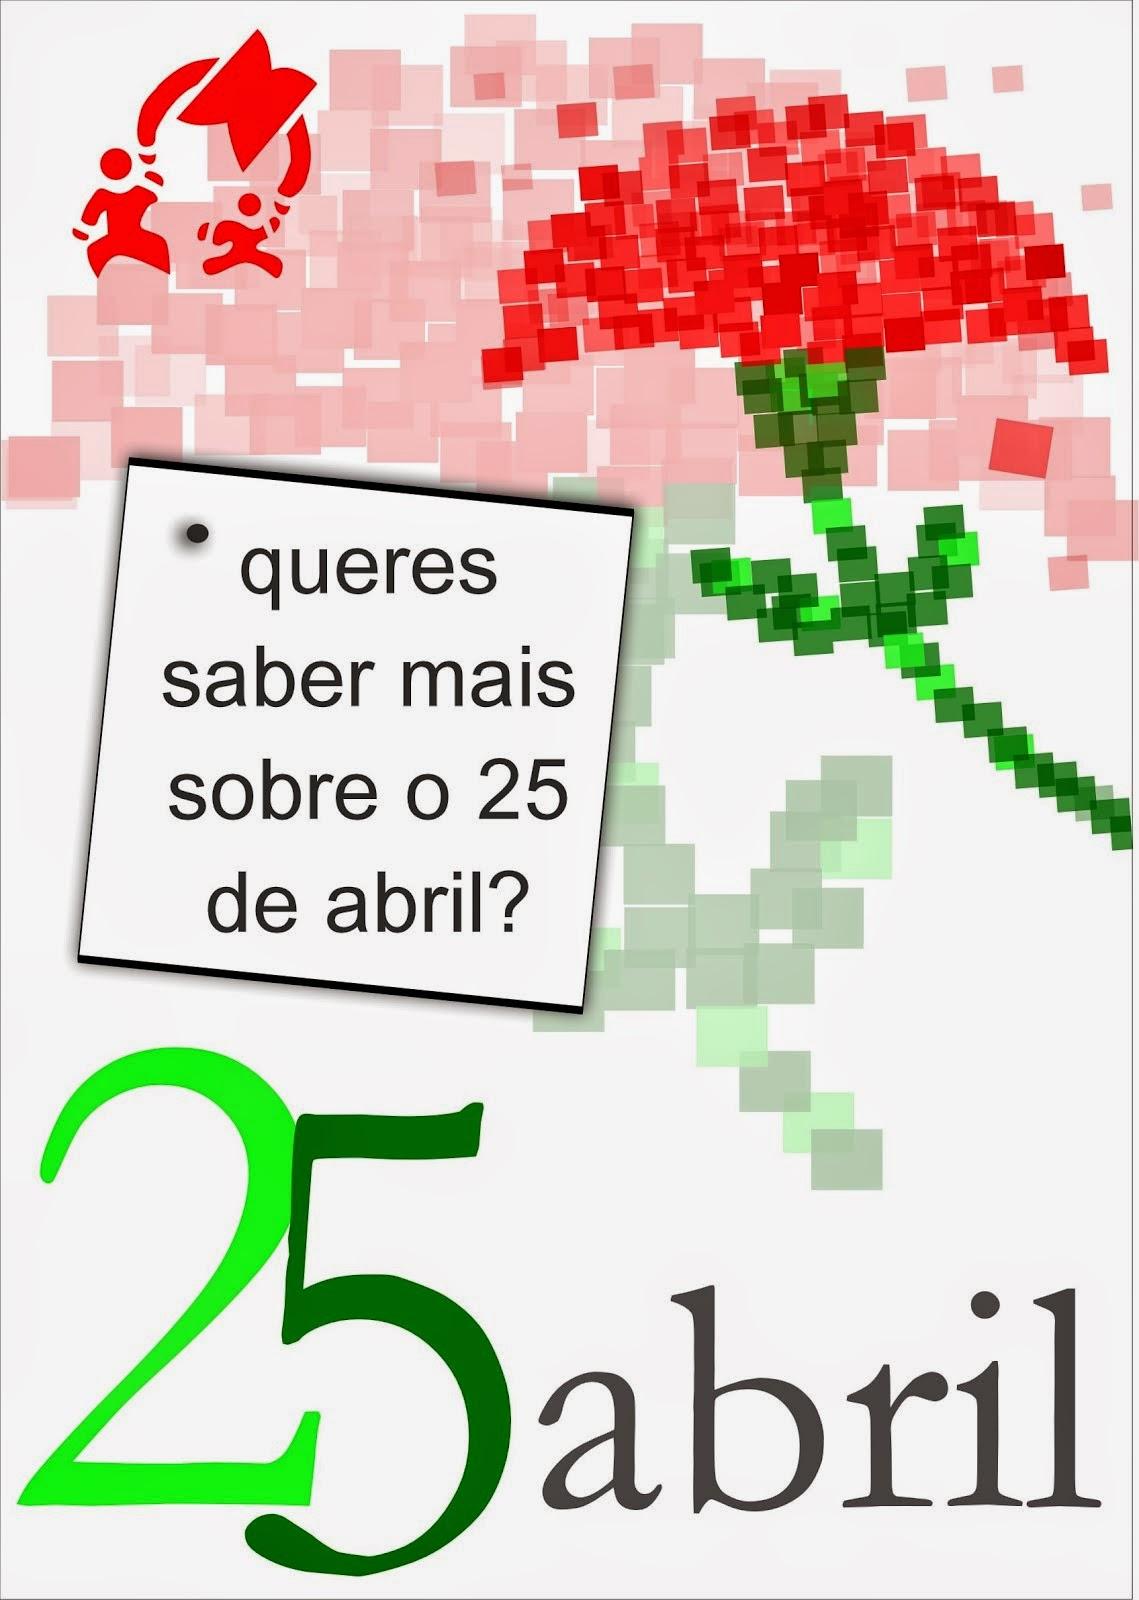 Queres saber mais sobre o 25 de abril?